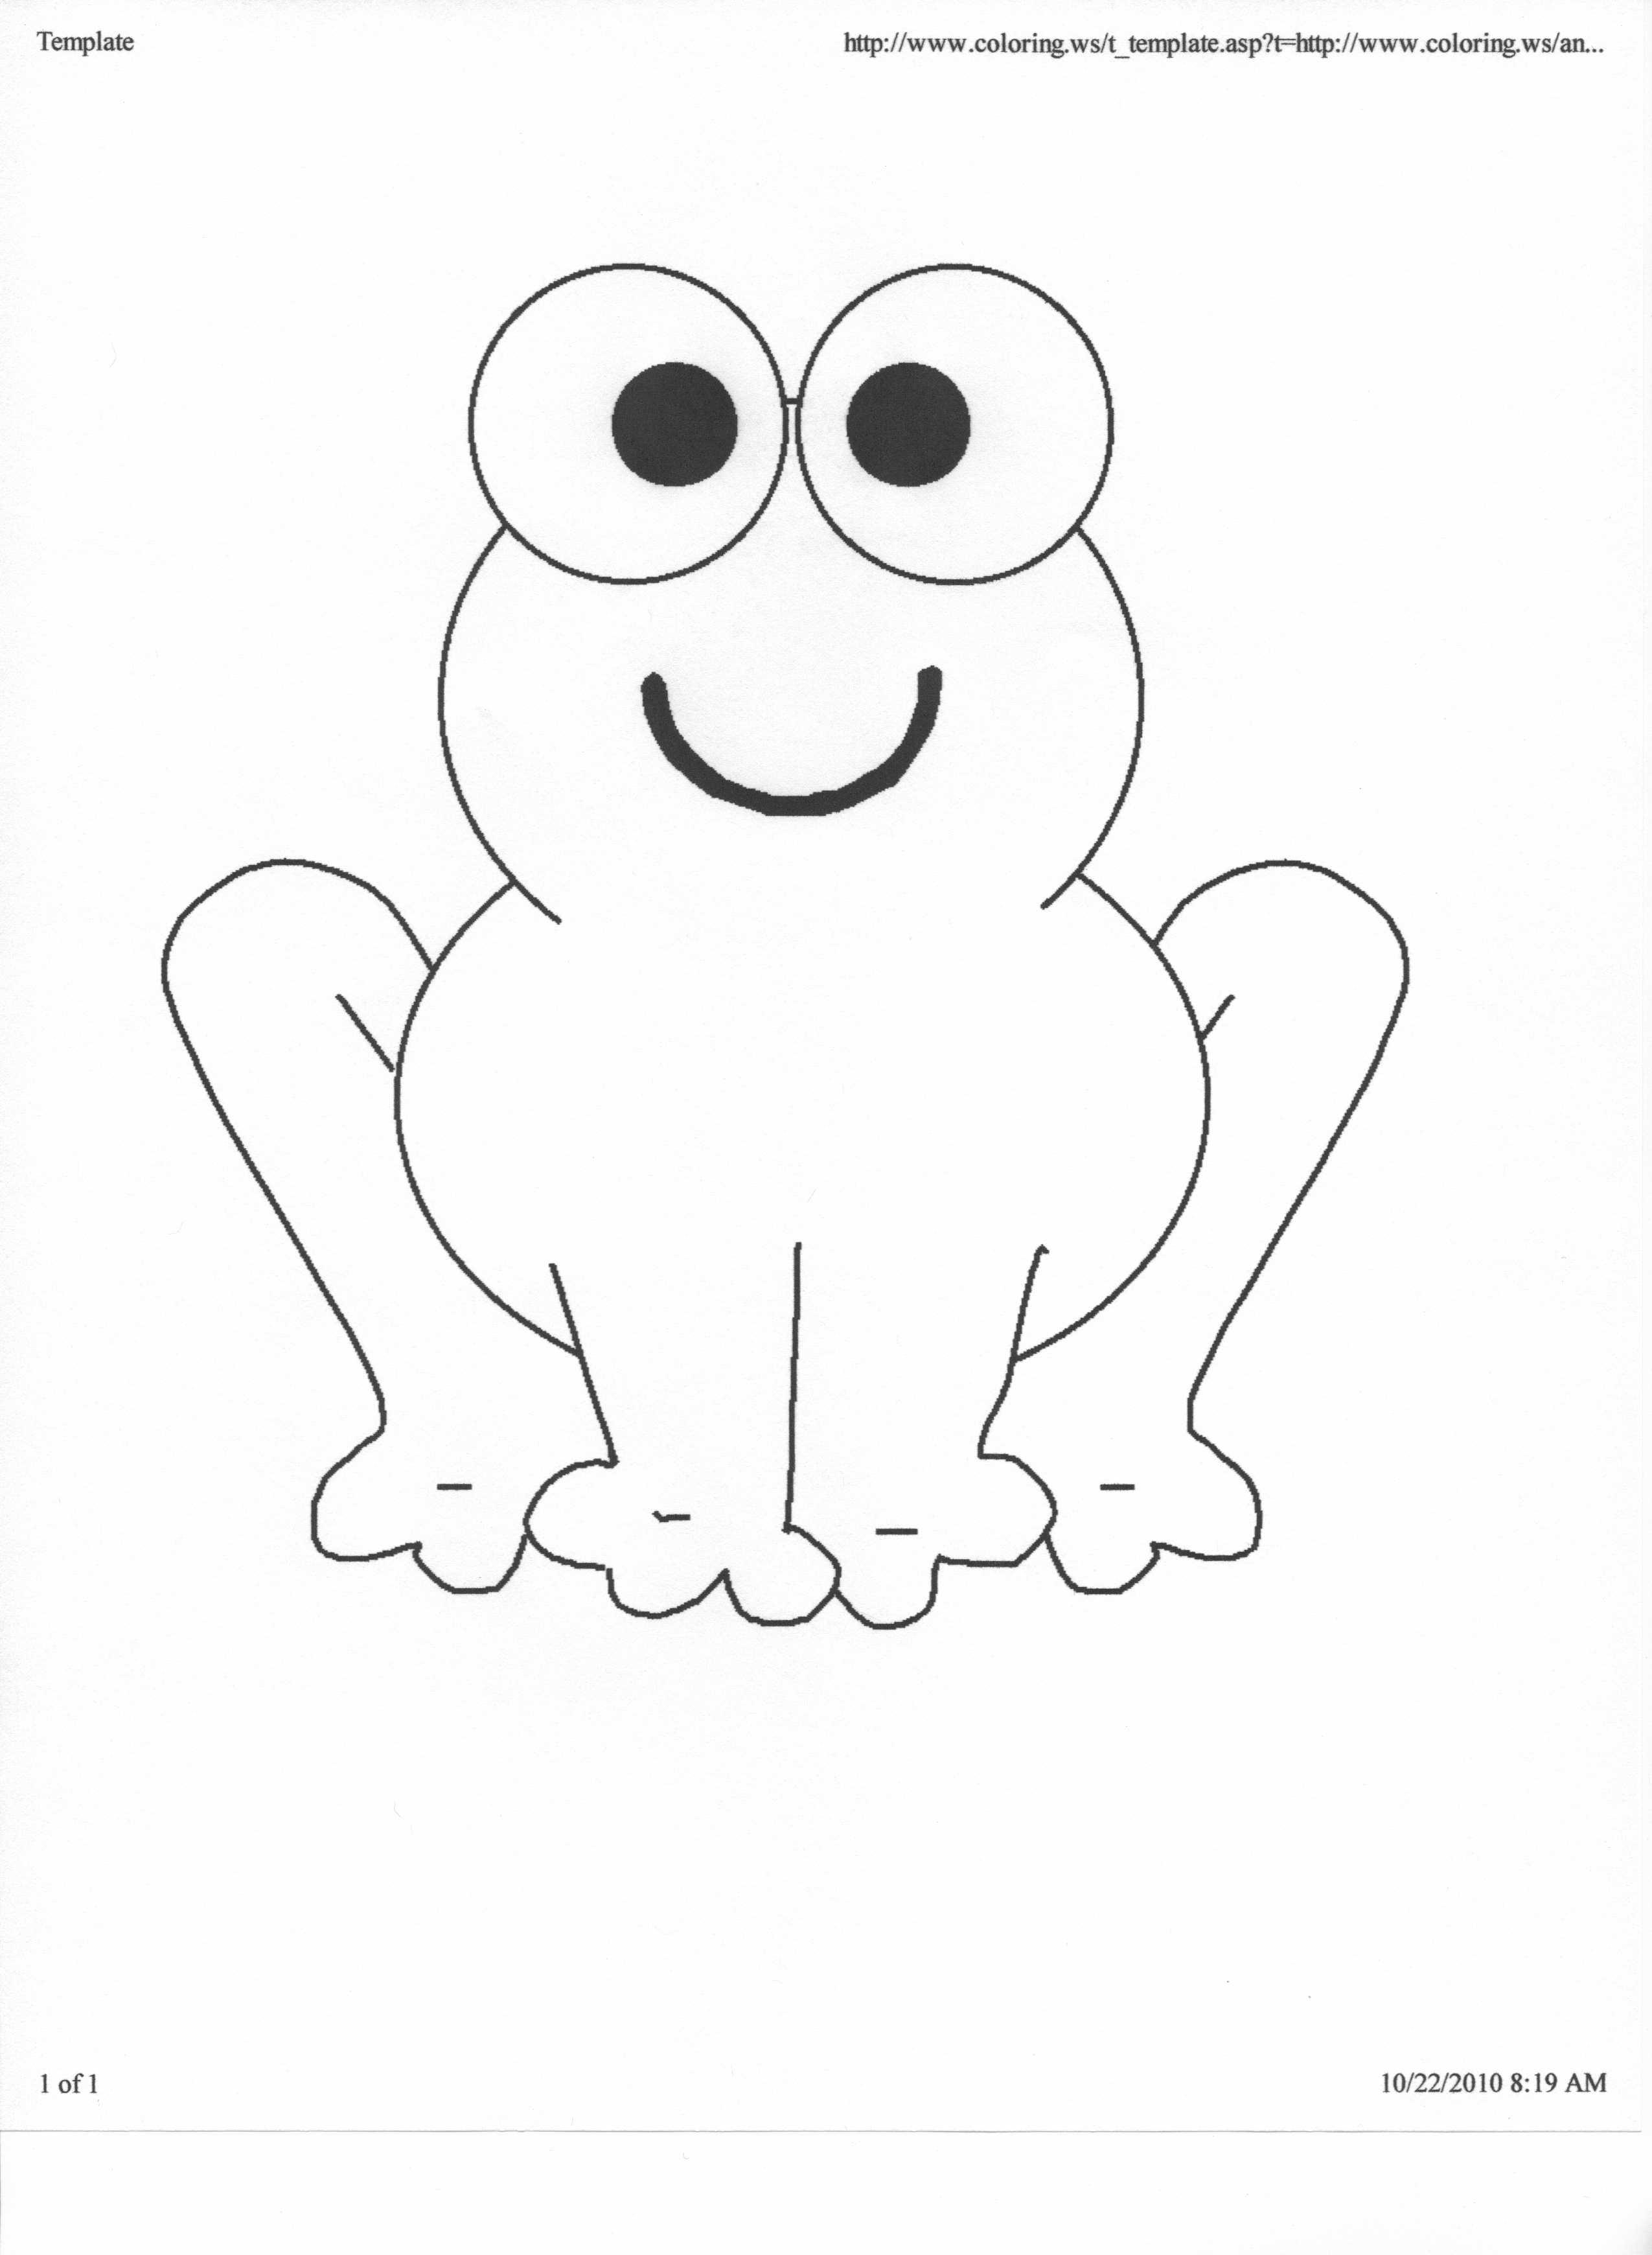 Frog Free Images At Clker